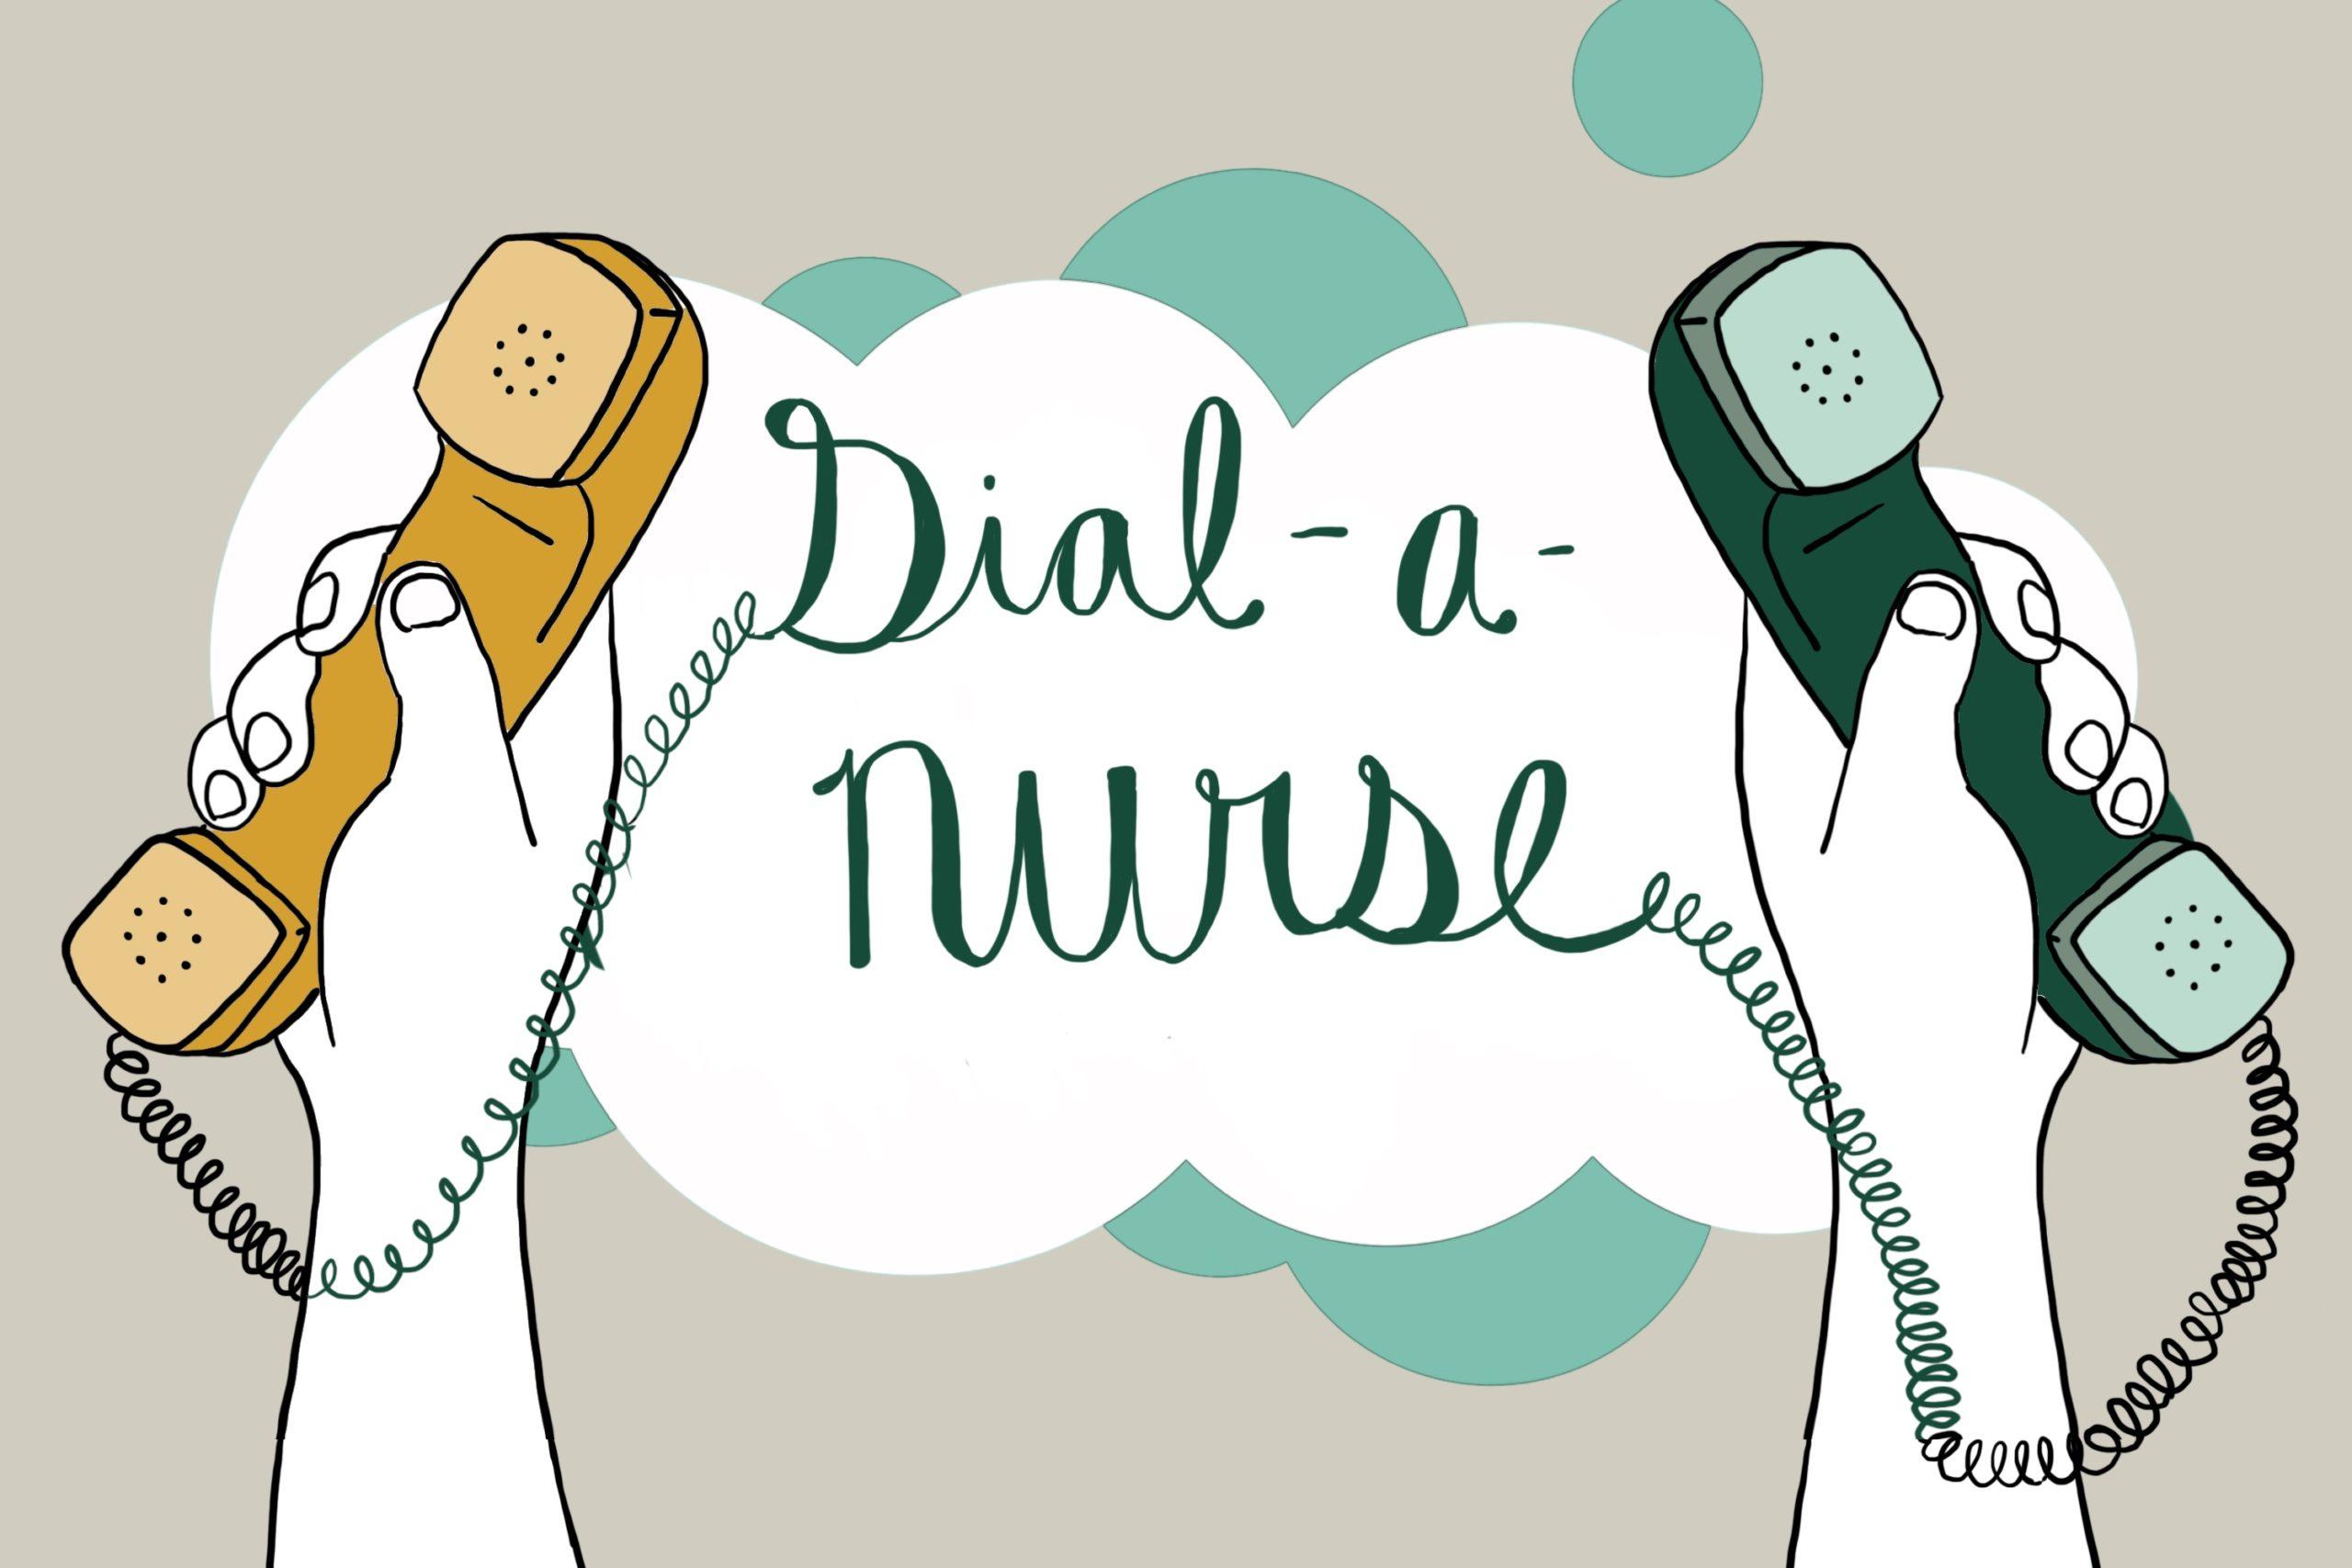 Dial A Nurse On Something Bonus Episode